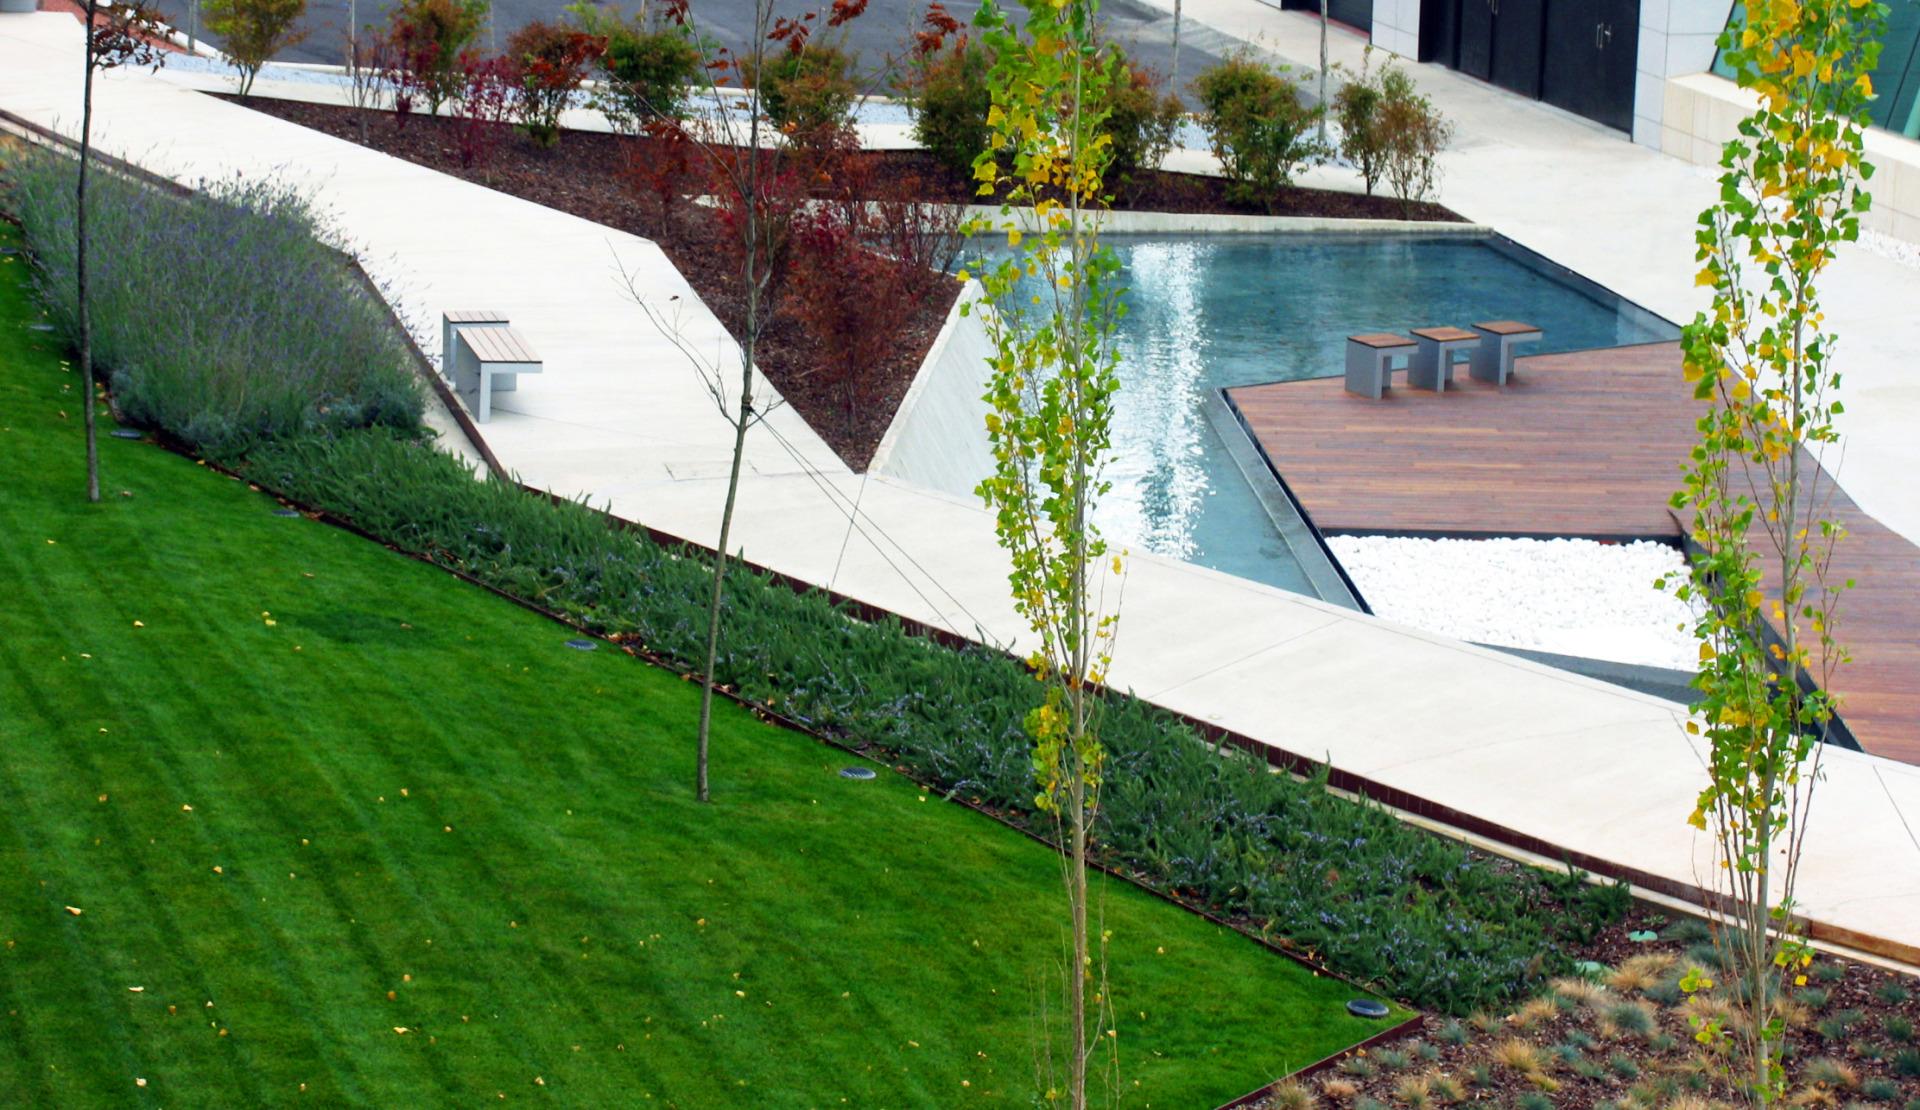 2007 - Würth La Rioja Museum Gardens